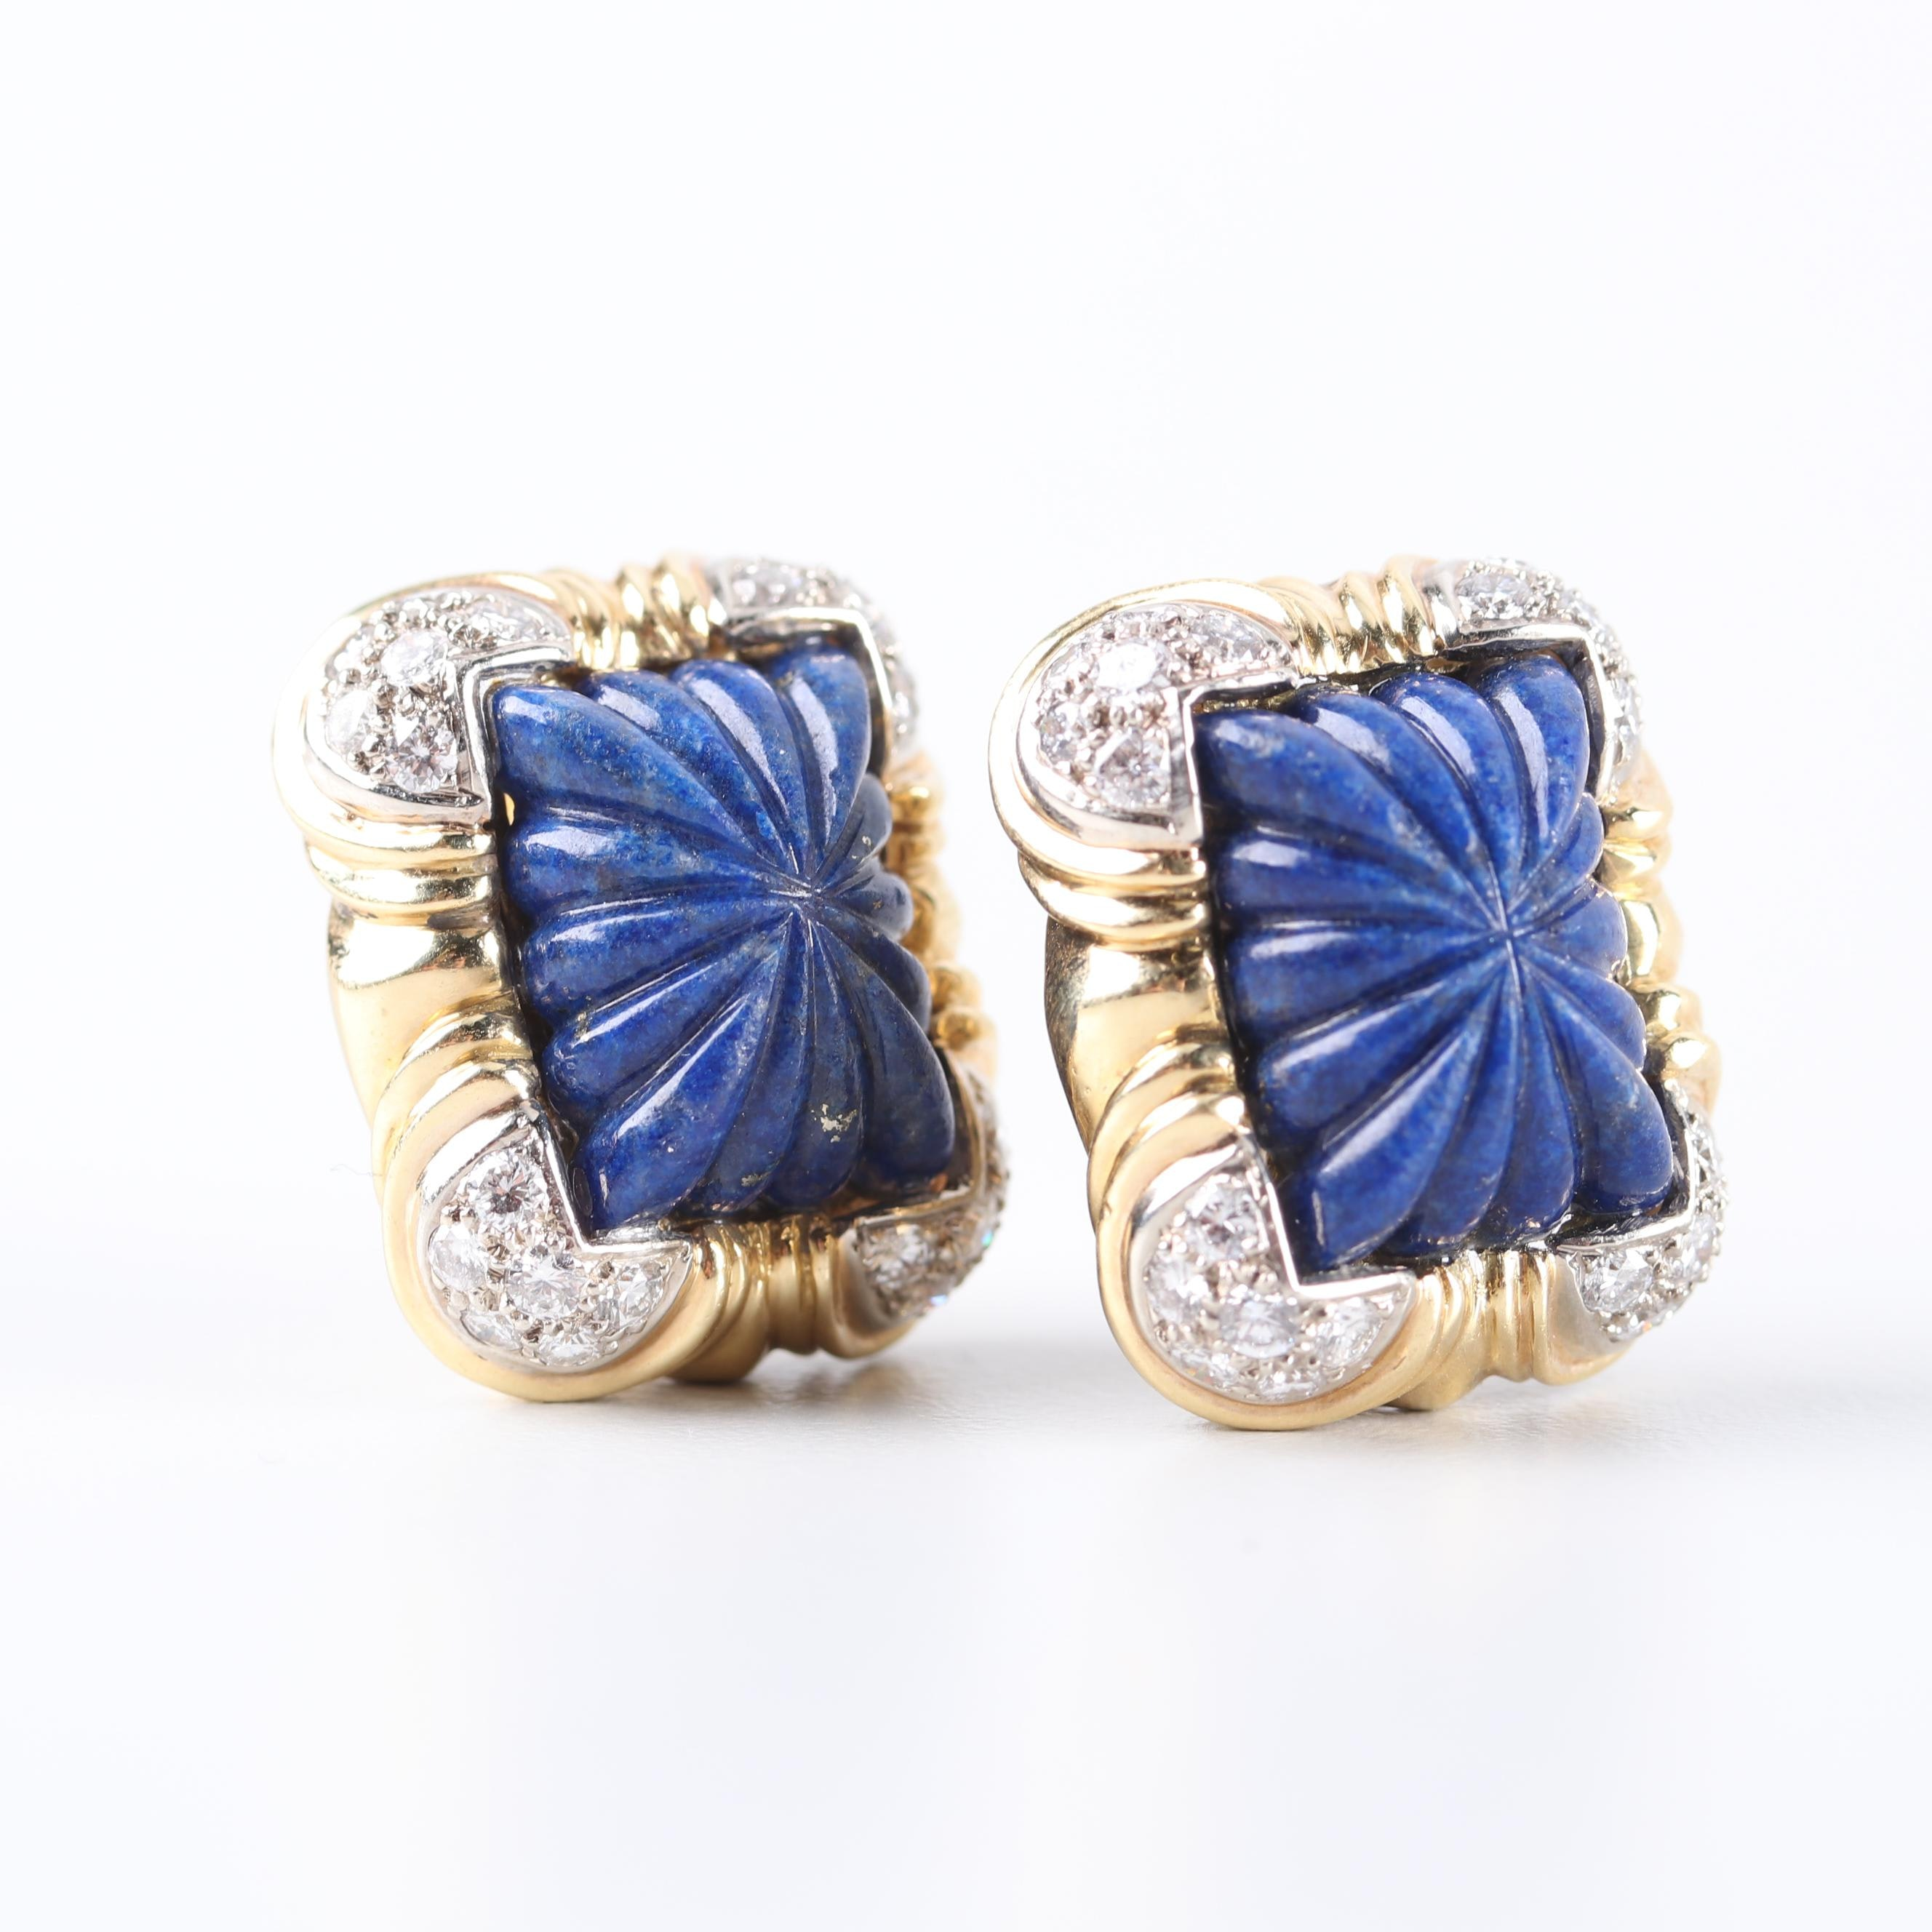 R. Stone 18K Yellow Gold Lapis Lazuli and 2.00 CTW Diamond Earrings